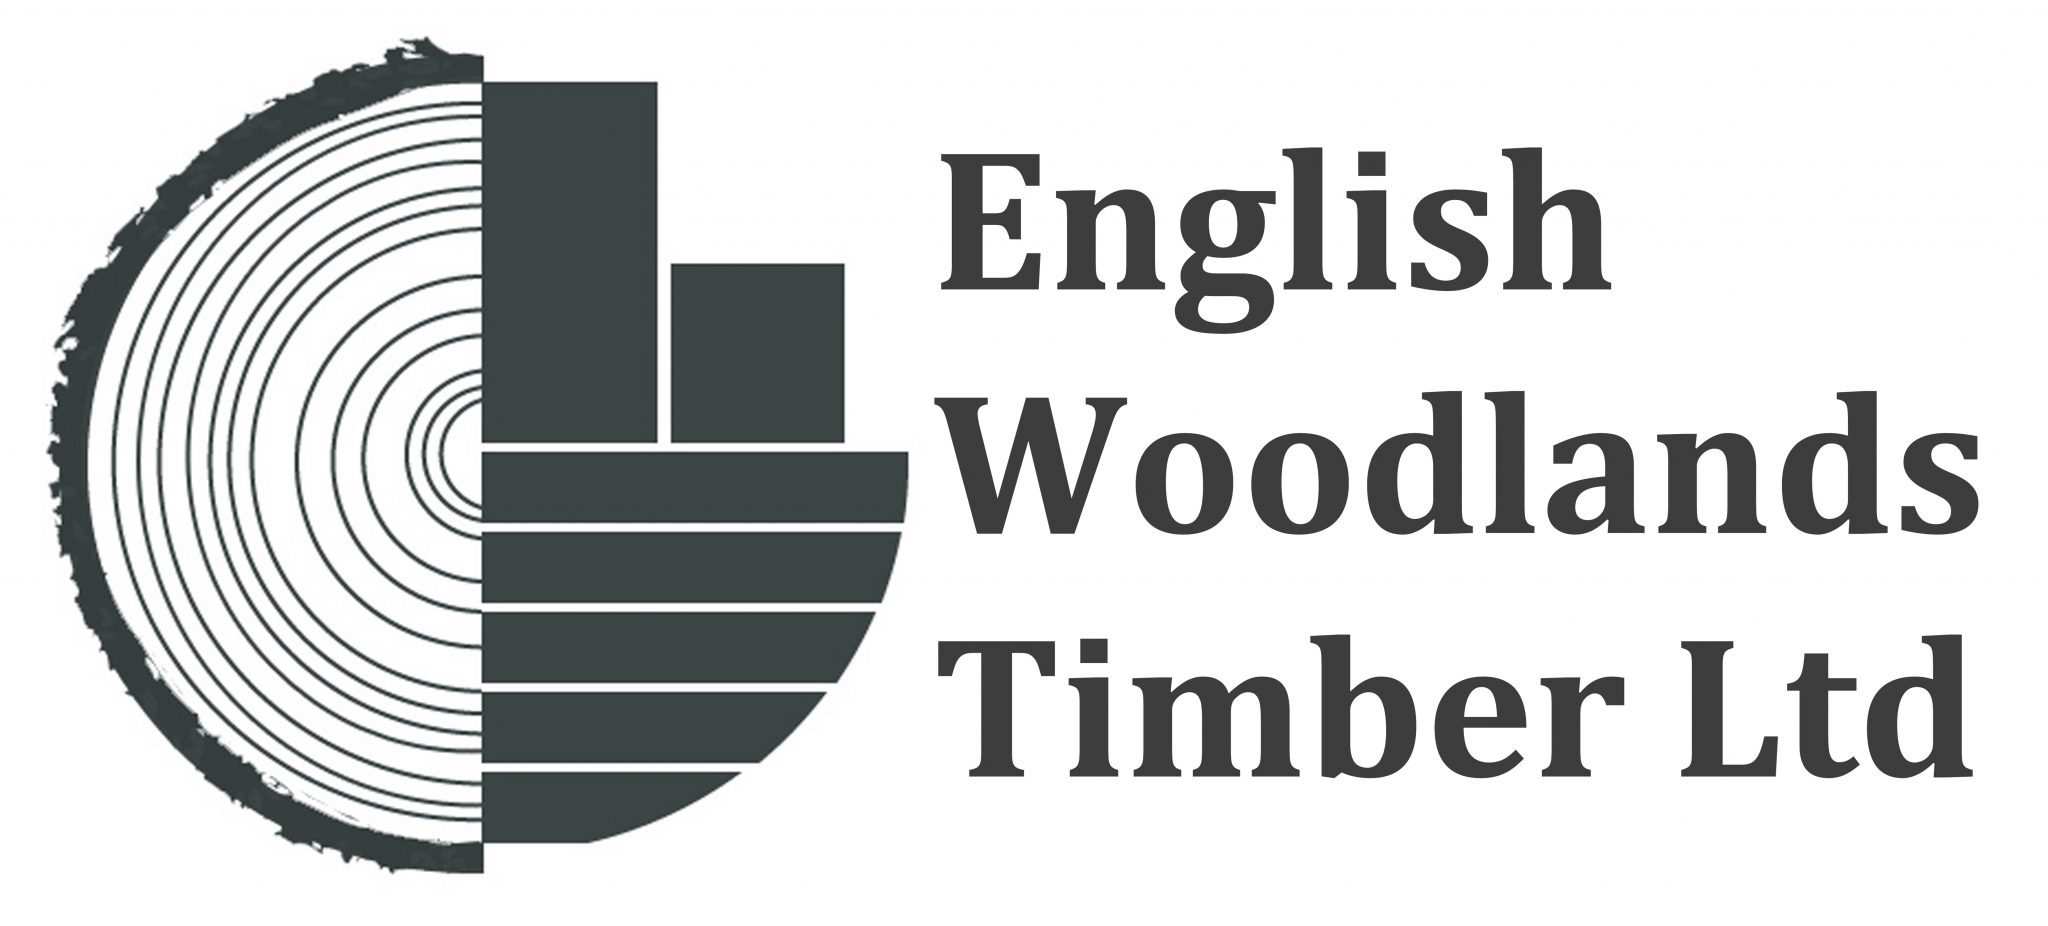 English Woodlands Timber Ltd